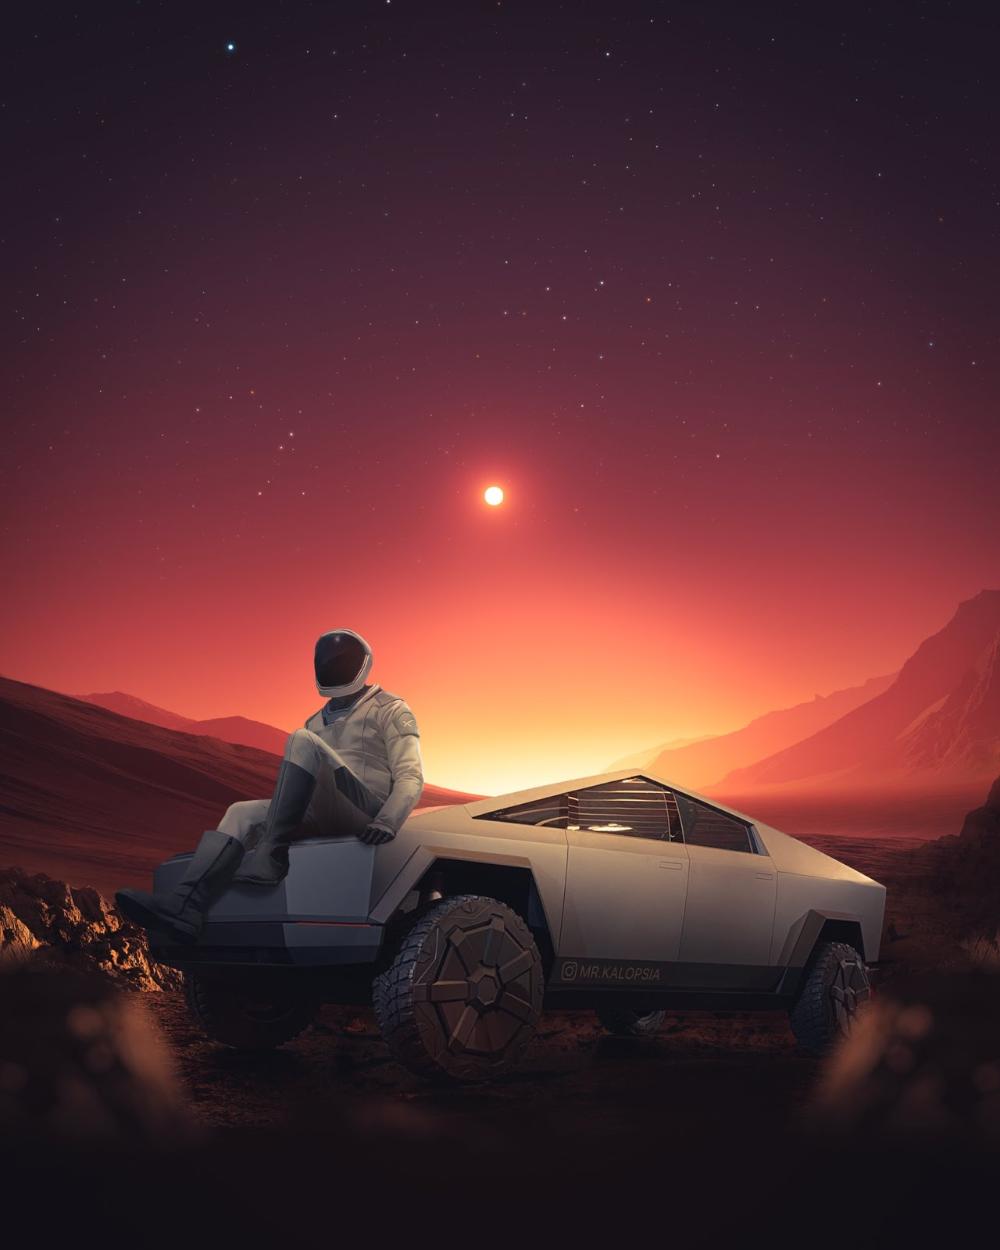 Starman Resting At His Tesla Cybertruck On Mars By Eashan Misra